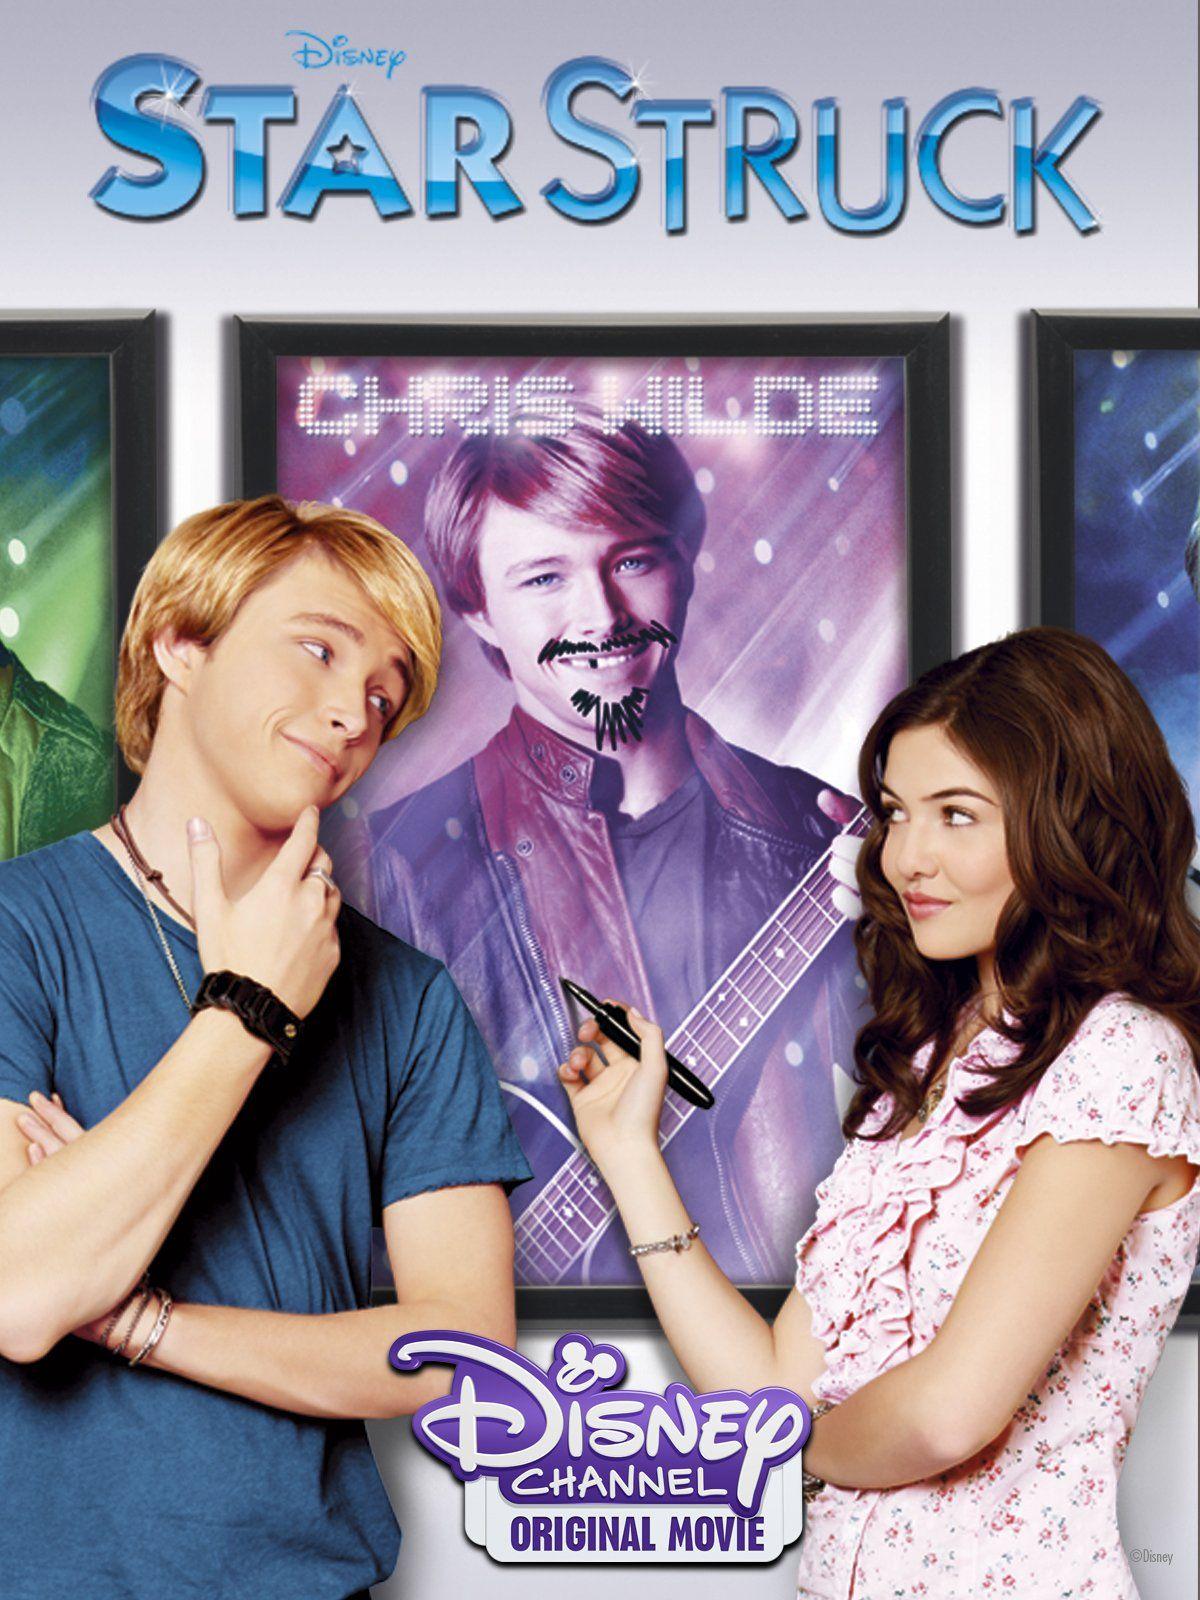 Pin By Carolina Yaque On Disney Channel Original Series Old Disney Channel Movies Old Disney Channel Old Disney Channel Shows